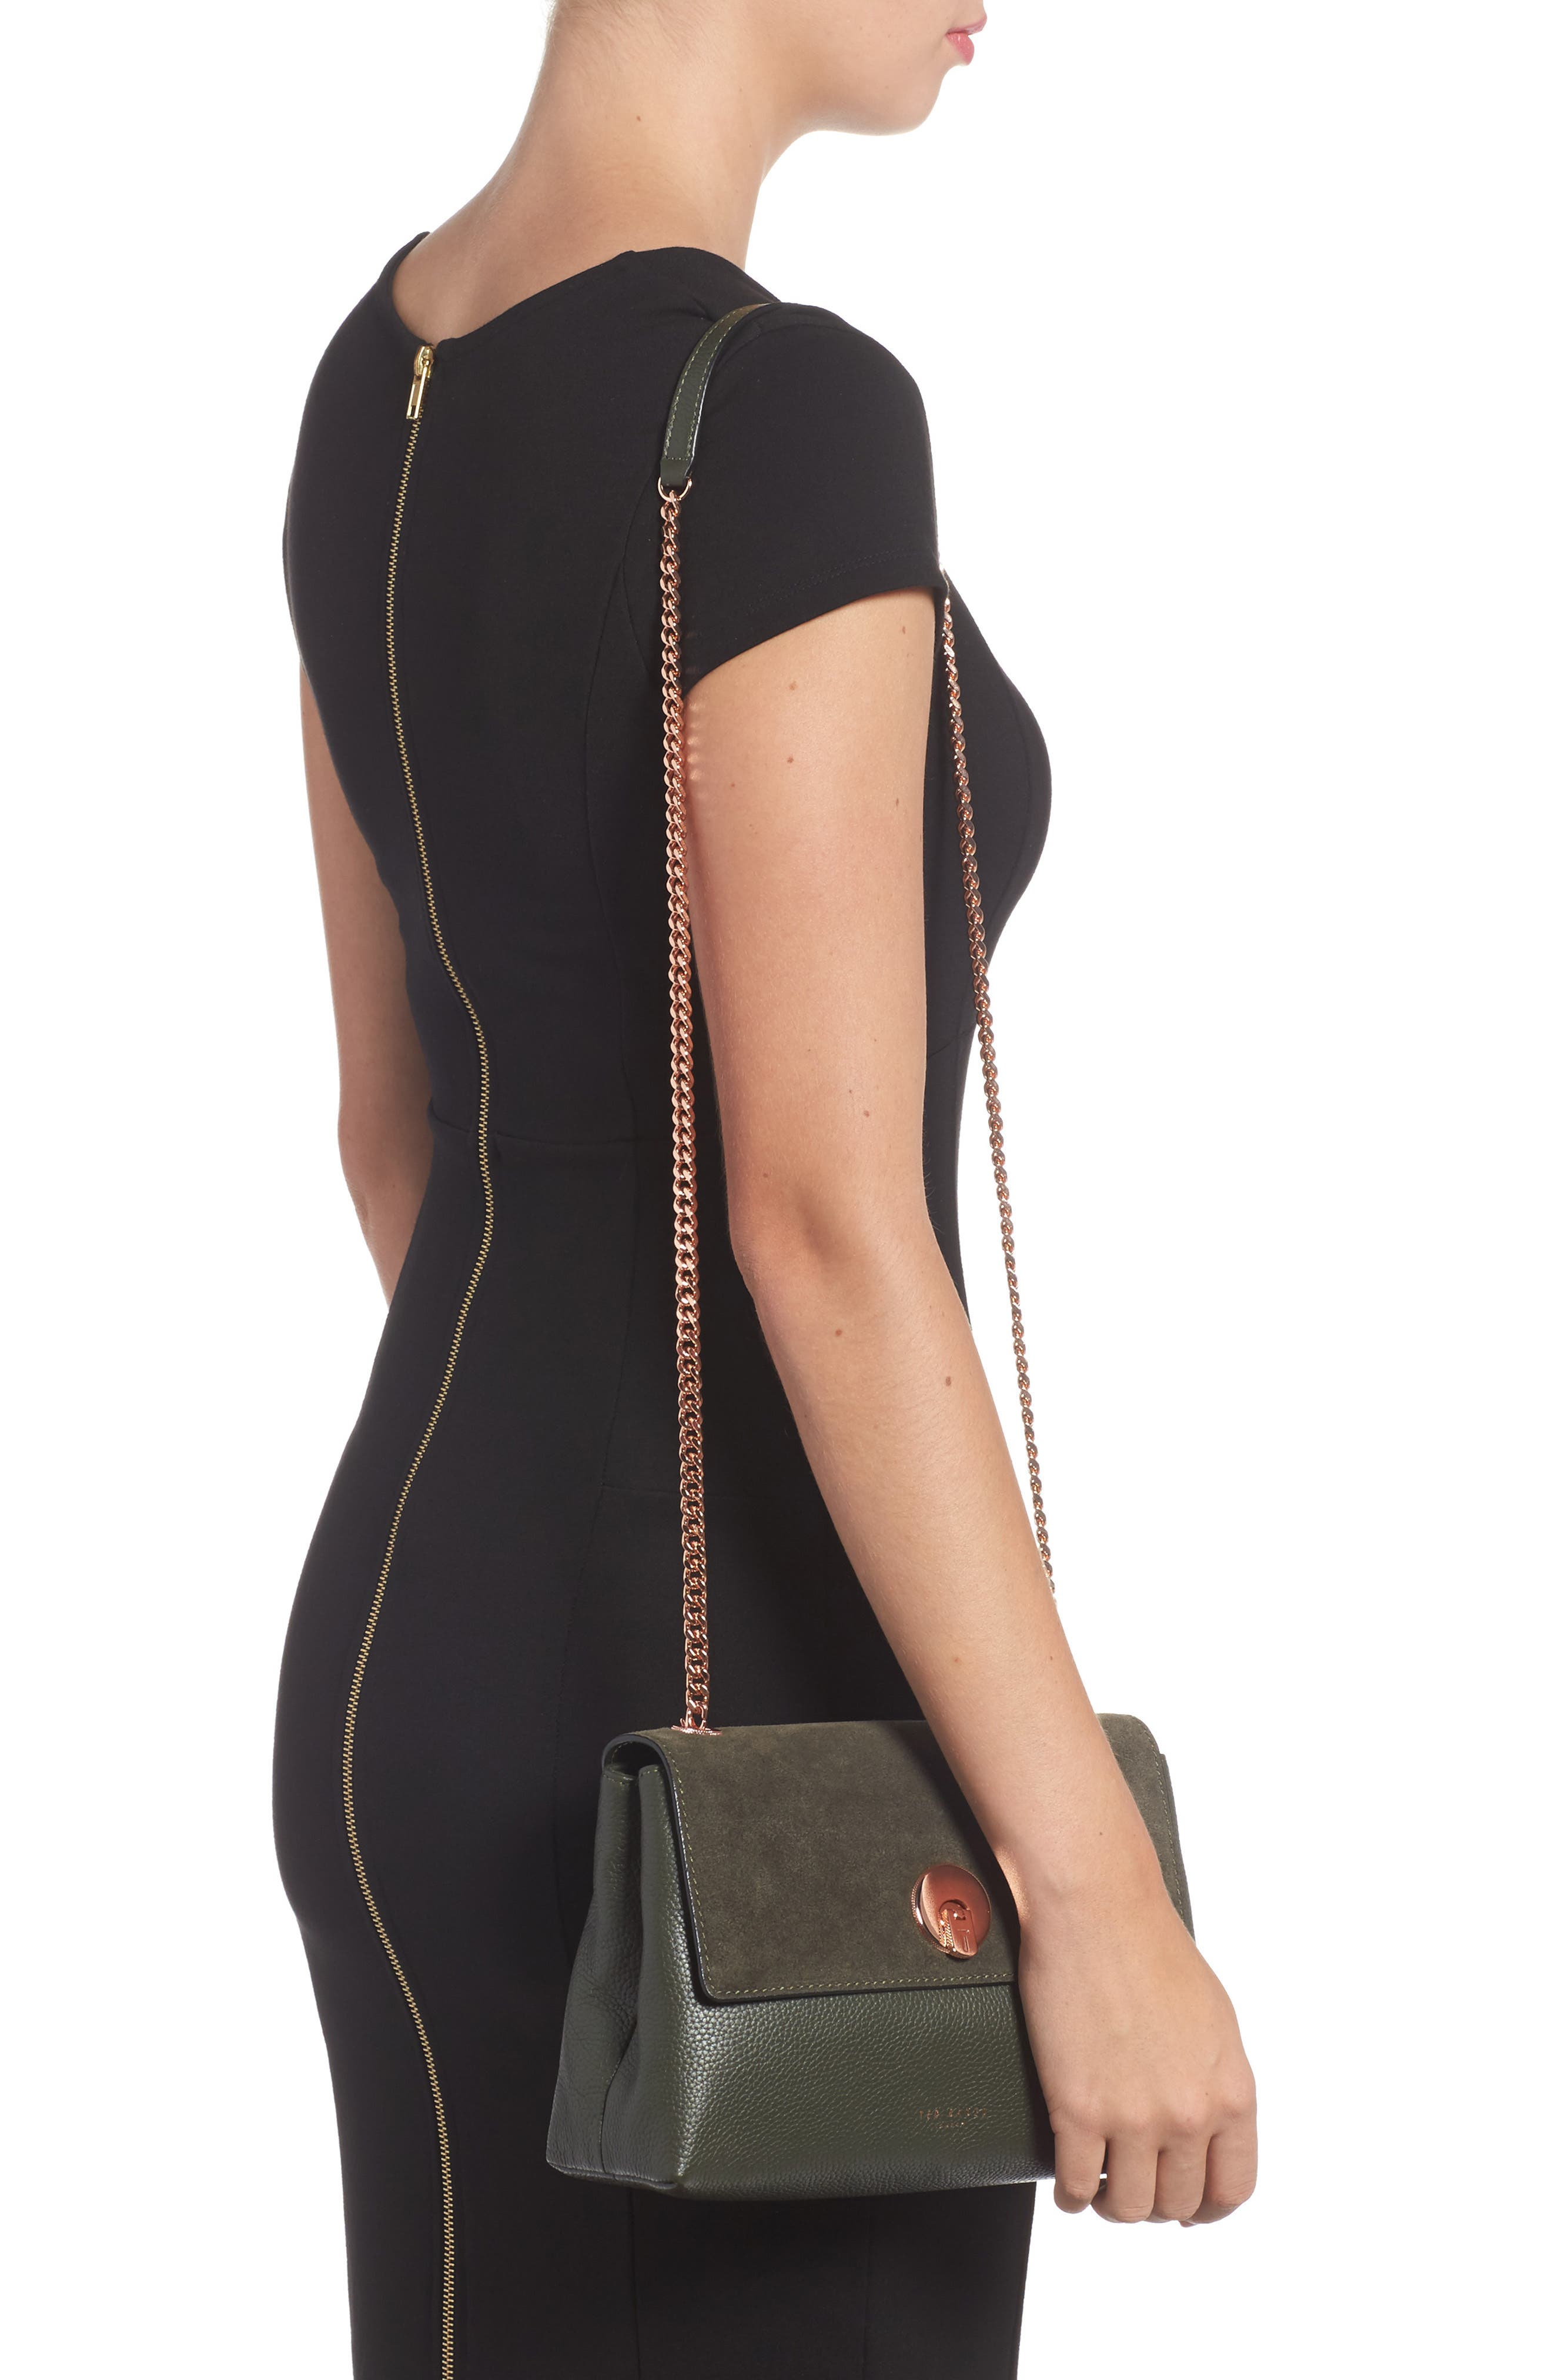 Sorikai Leather & Suede Crossbody Bag,                             Alternate thumbnail 2, color,                             312